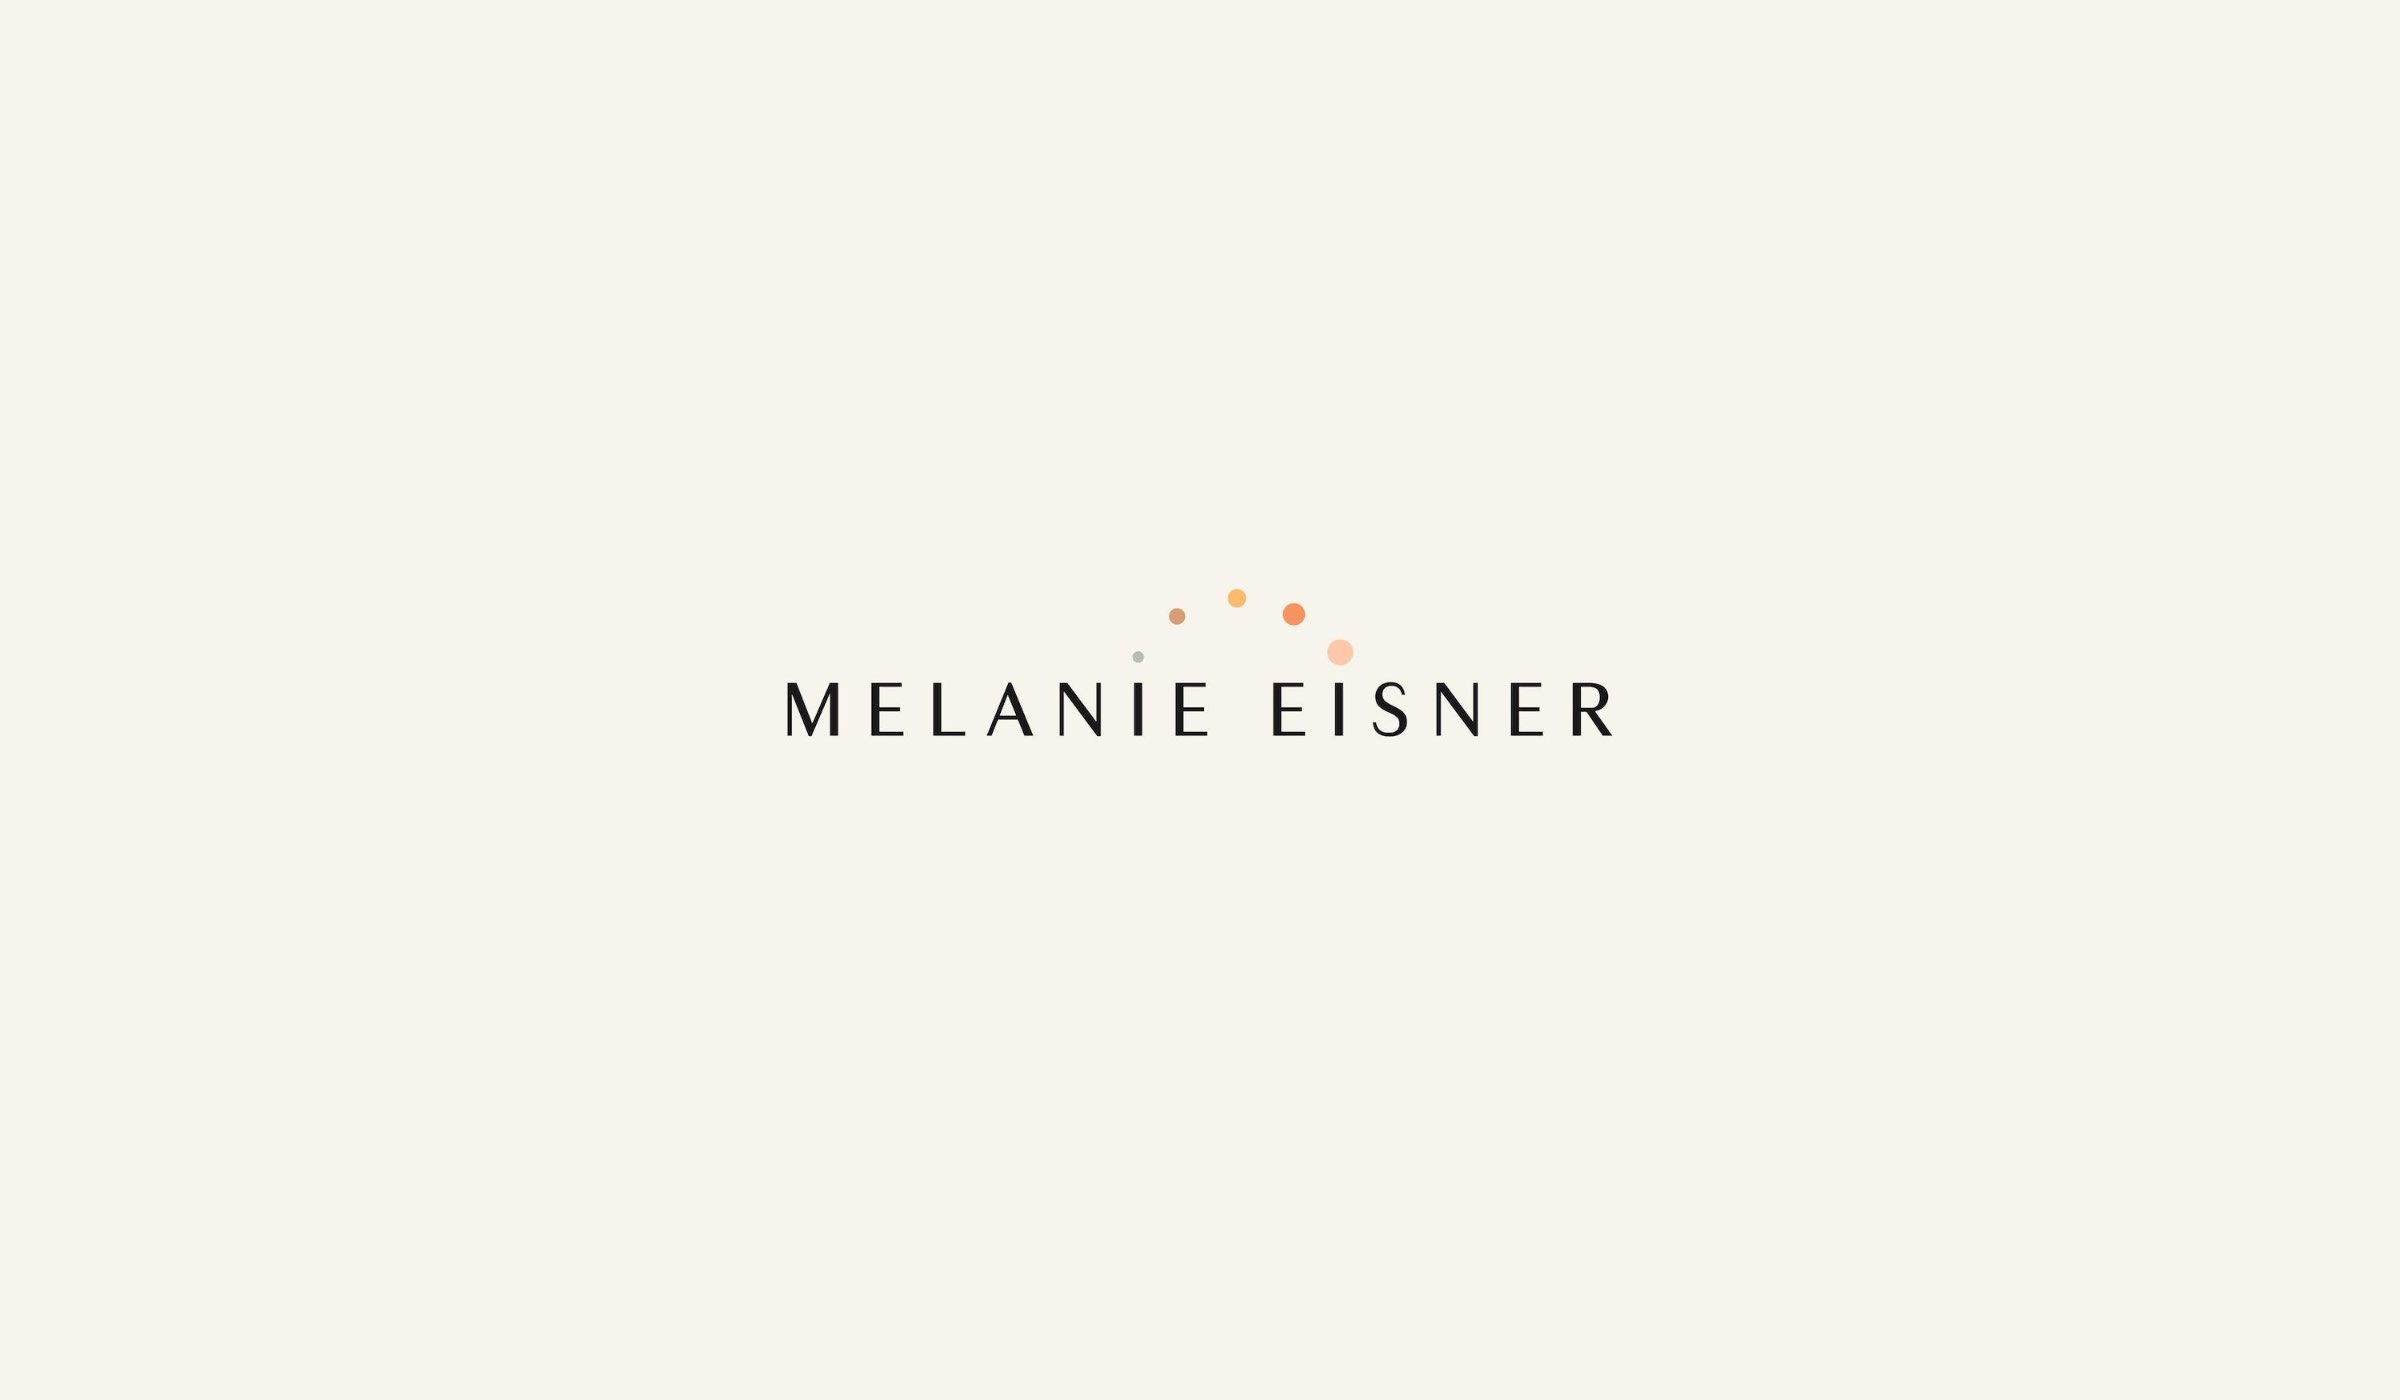 Melanie Eisner Text Logo